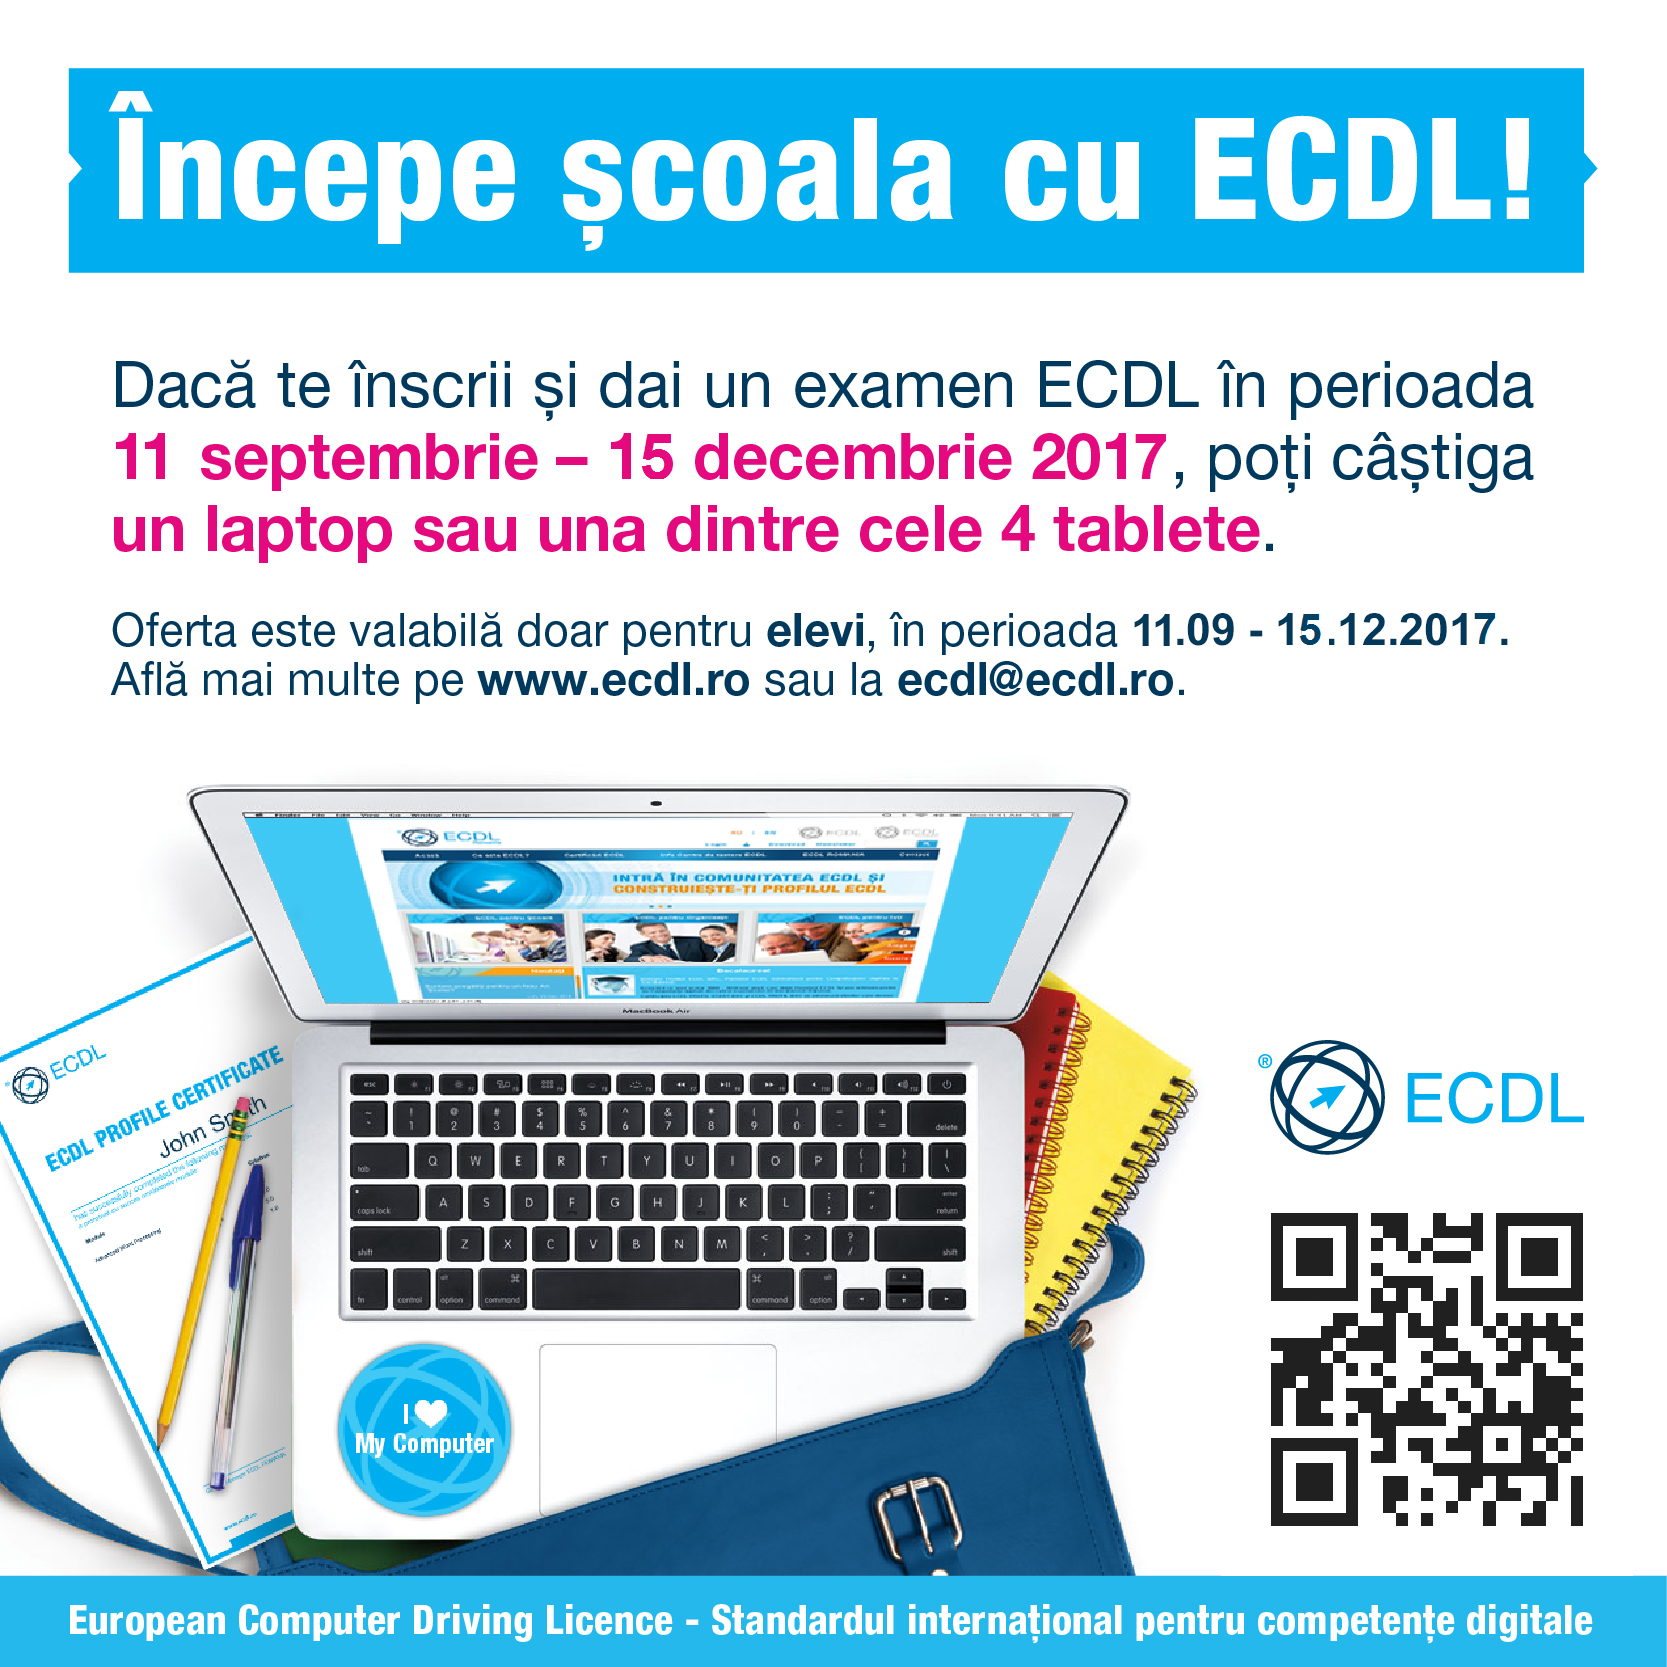 ECDL_Scoala_WebBanner_400x400px.png